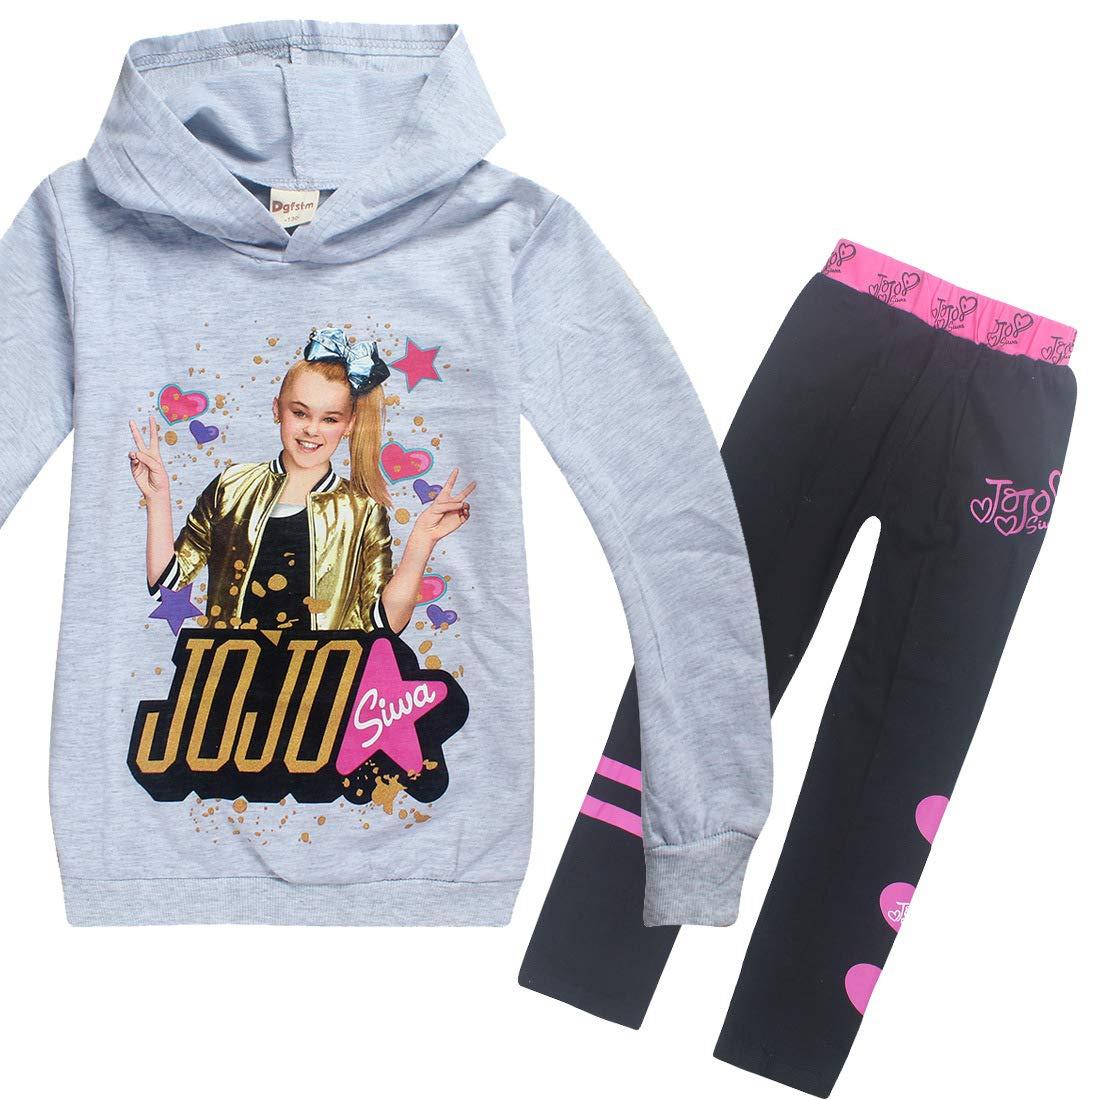 Wazonton JoJo Siwa Hoodies Casual Sweatshirts Shirt Tops Clothes and Trousers for Girls